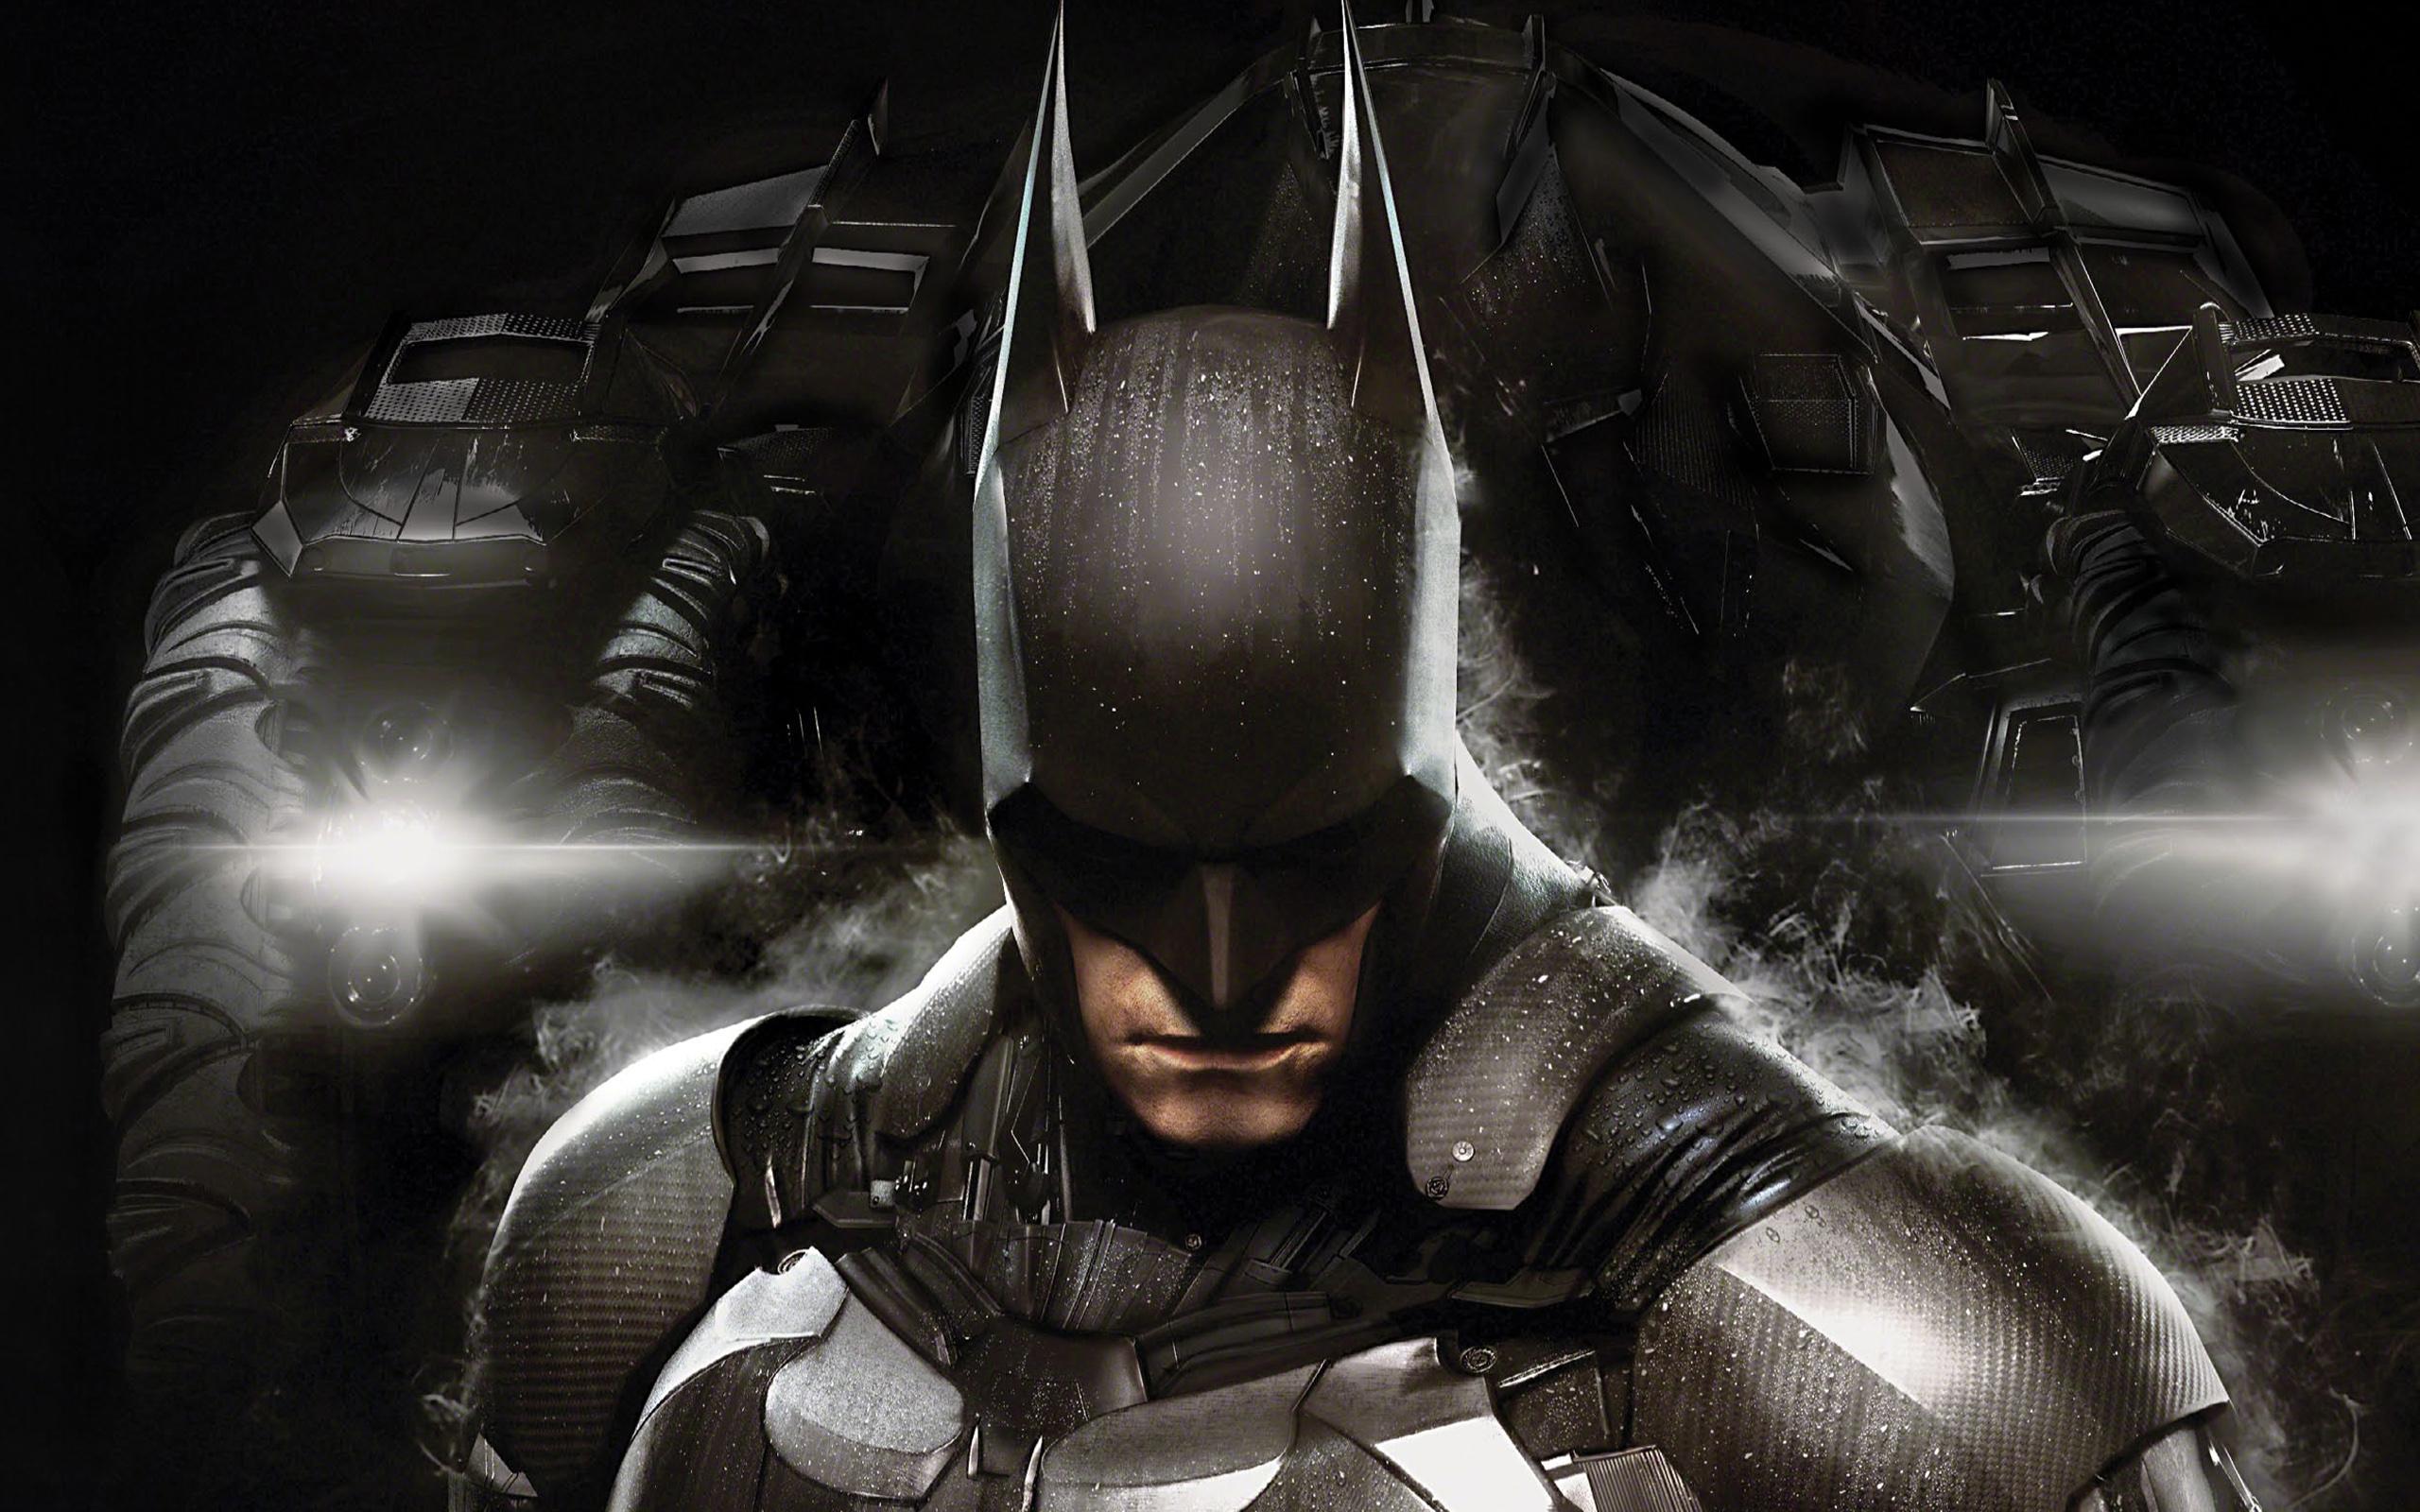 2014_batman_arkham_knight-wide-batman-arkham-knight-has-shadow-of-mordor-s-combat-affected-it.jpeg